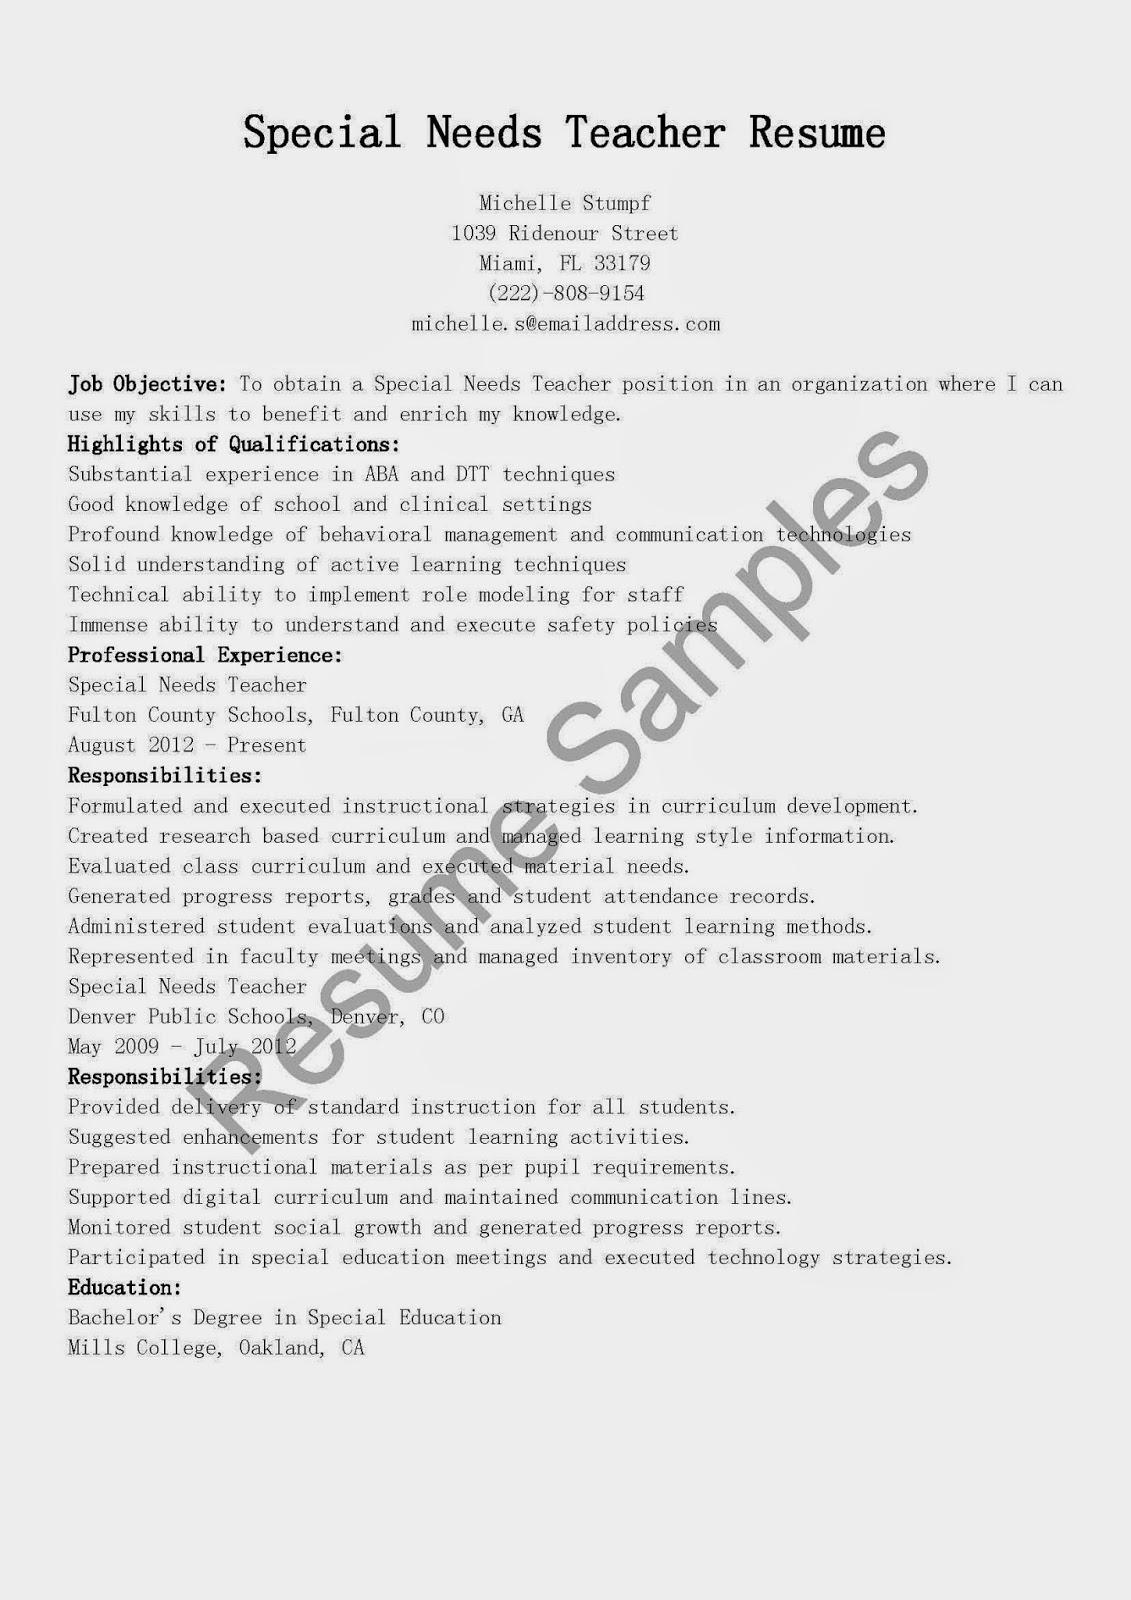 Resume Samples Special Needs Teacher Sample Best